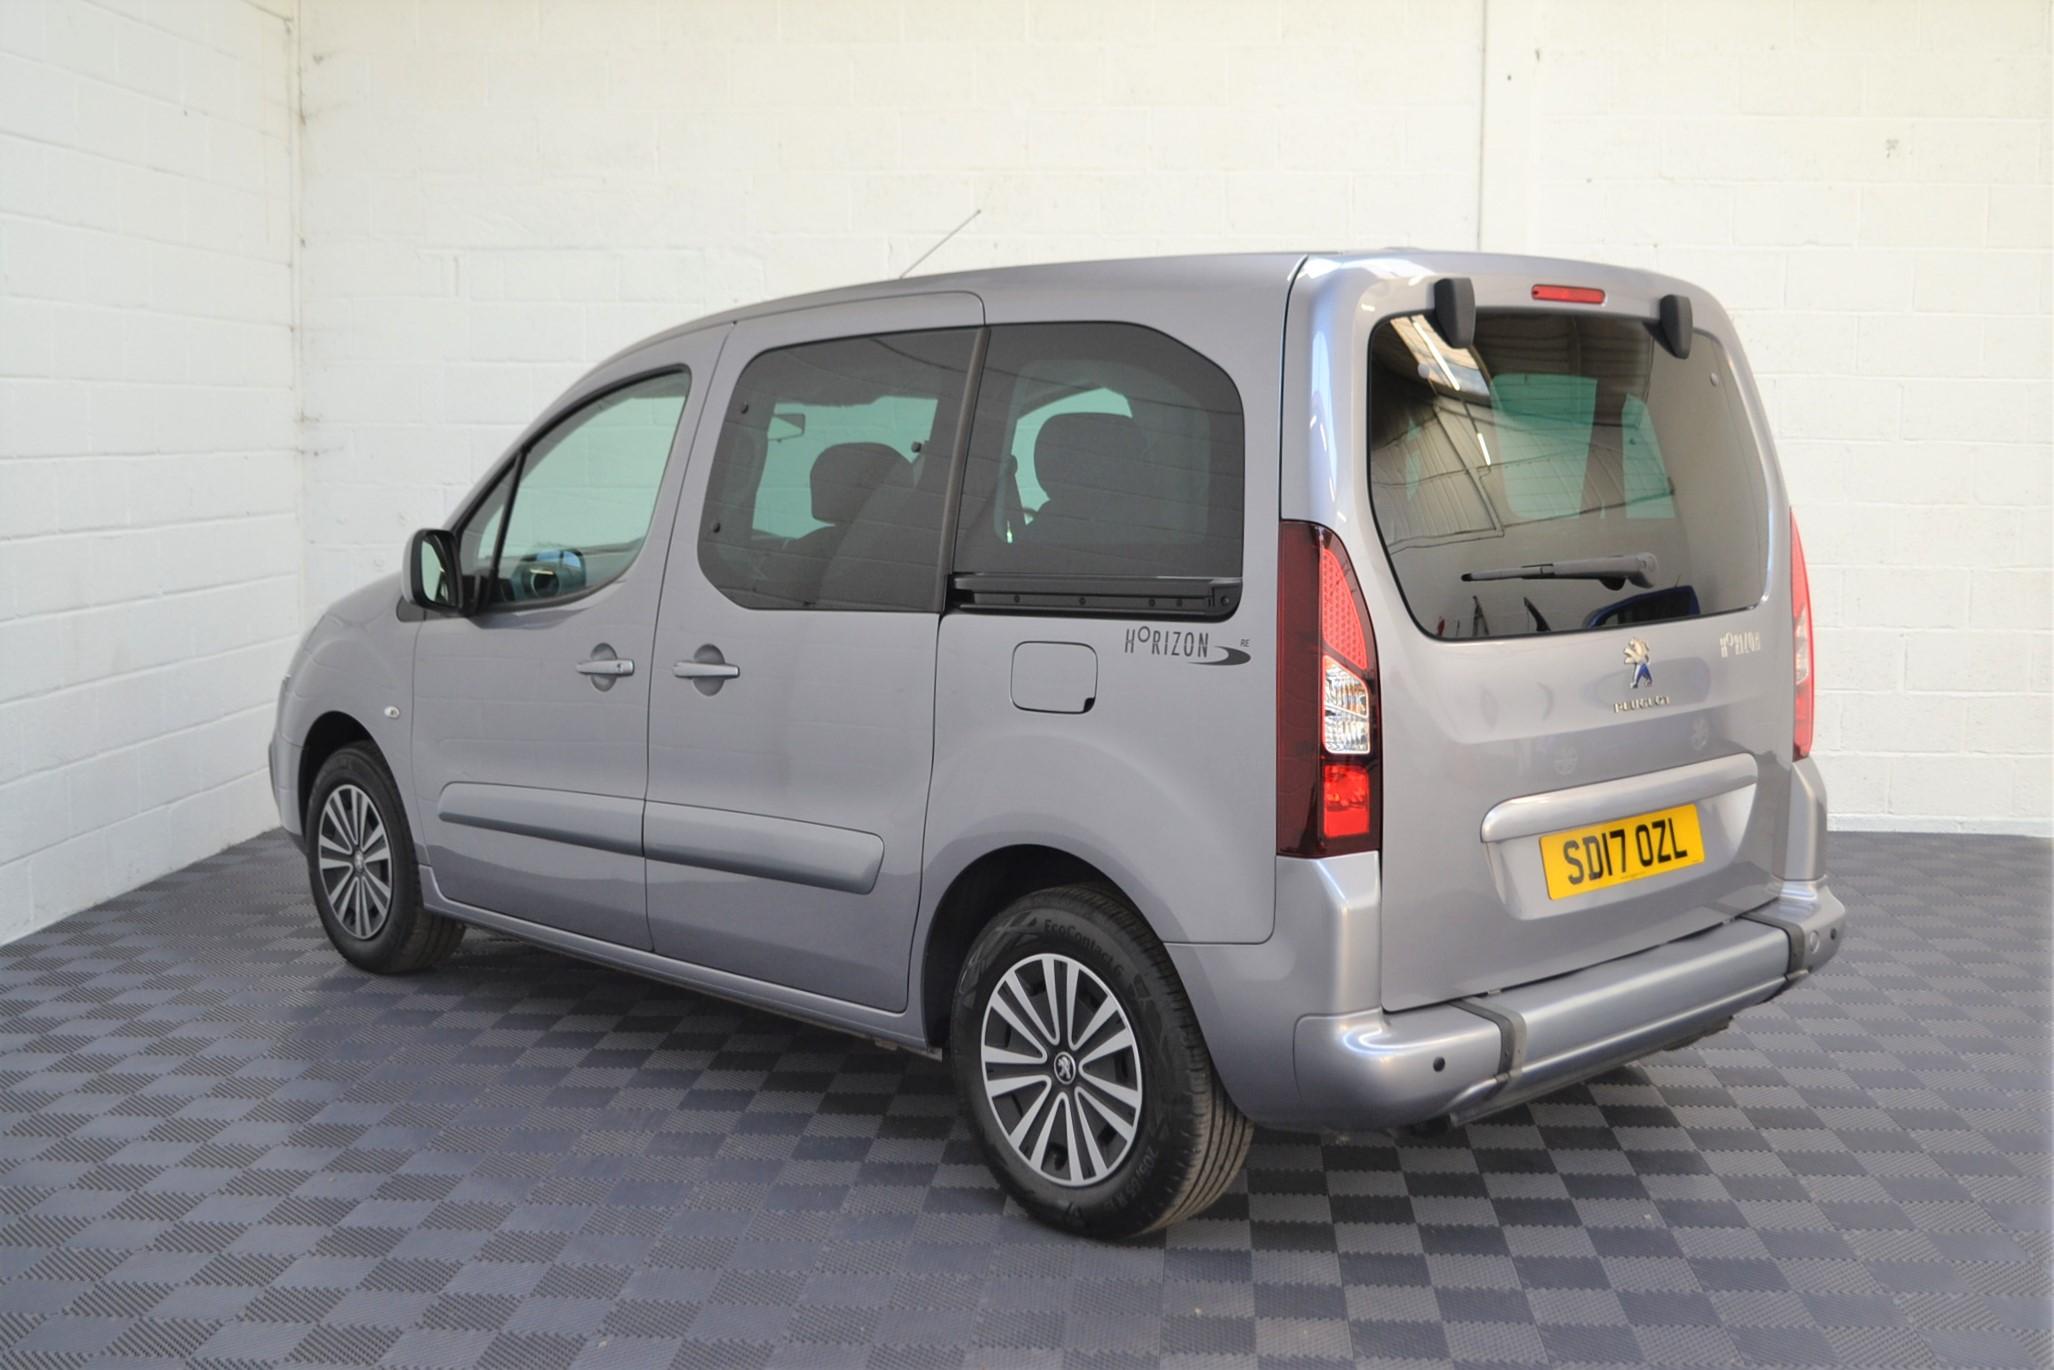 WAV Cars For Sale Bristol Wheelchair Accessible Vehicles Used For Sale Somerset Devon Dorset Bath Peugeot Partner SD17 OZL 2